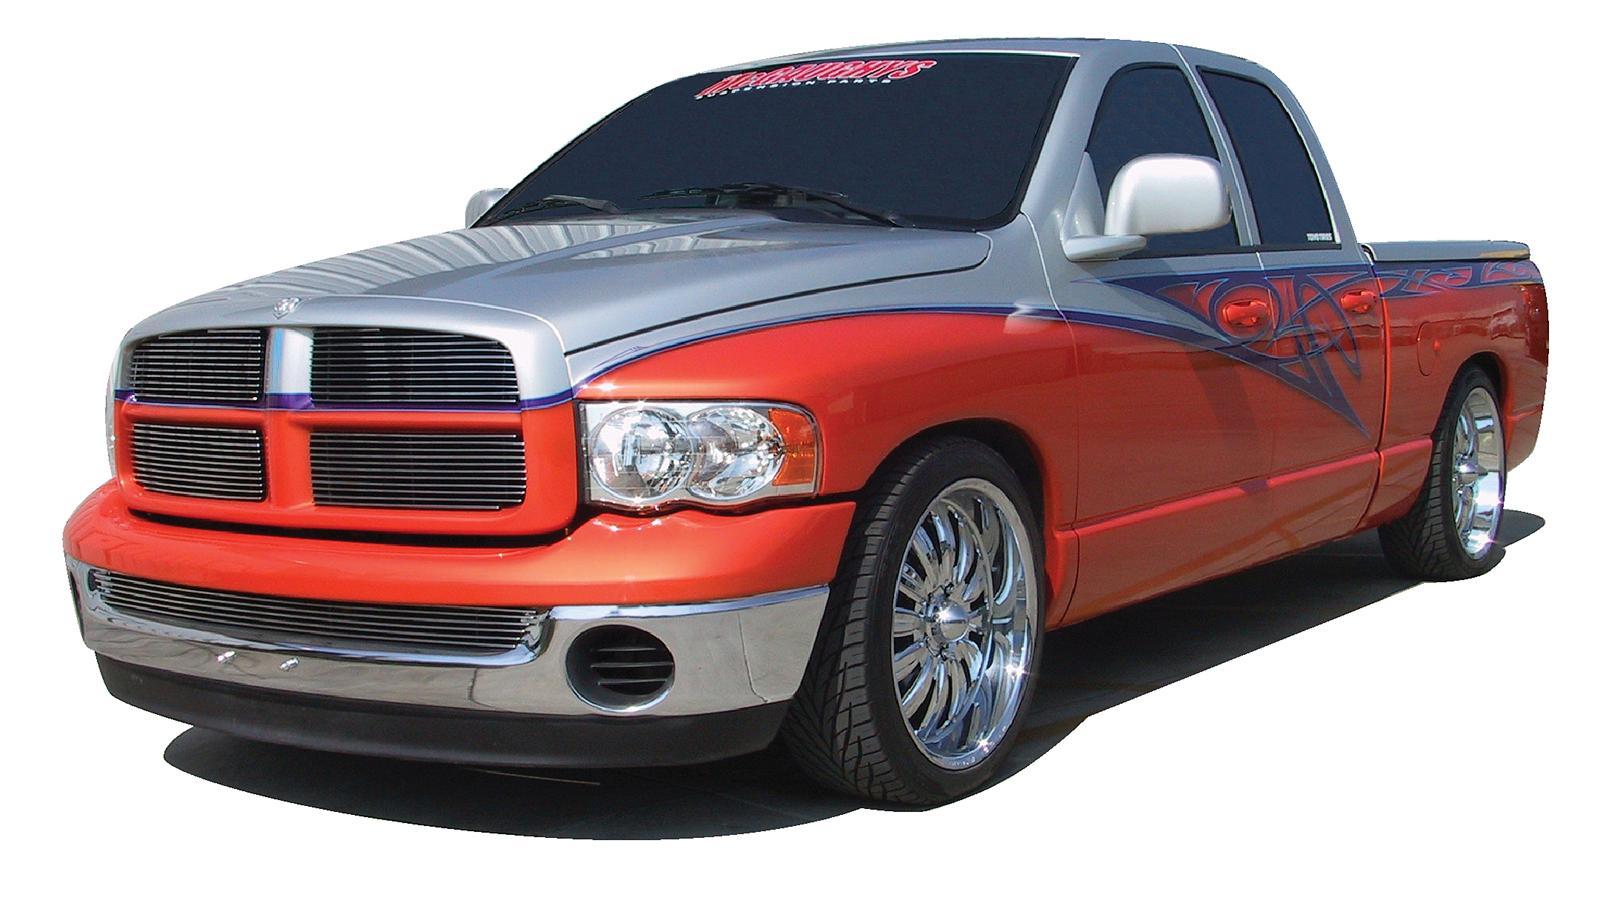 Mcgaughys 4 6 Drop Kit 02 05 Dodge Ram 1500 Rc 2wd 2012 Accessories